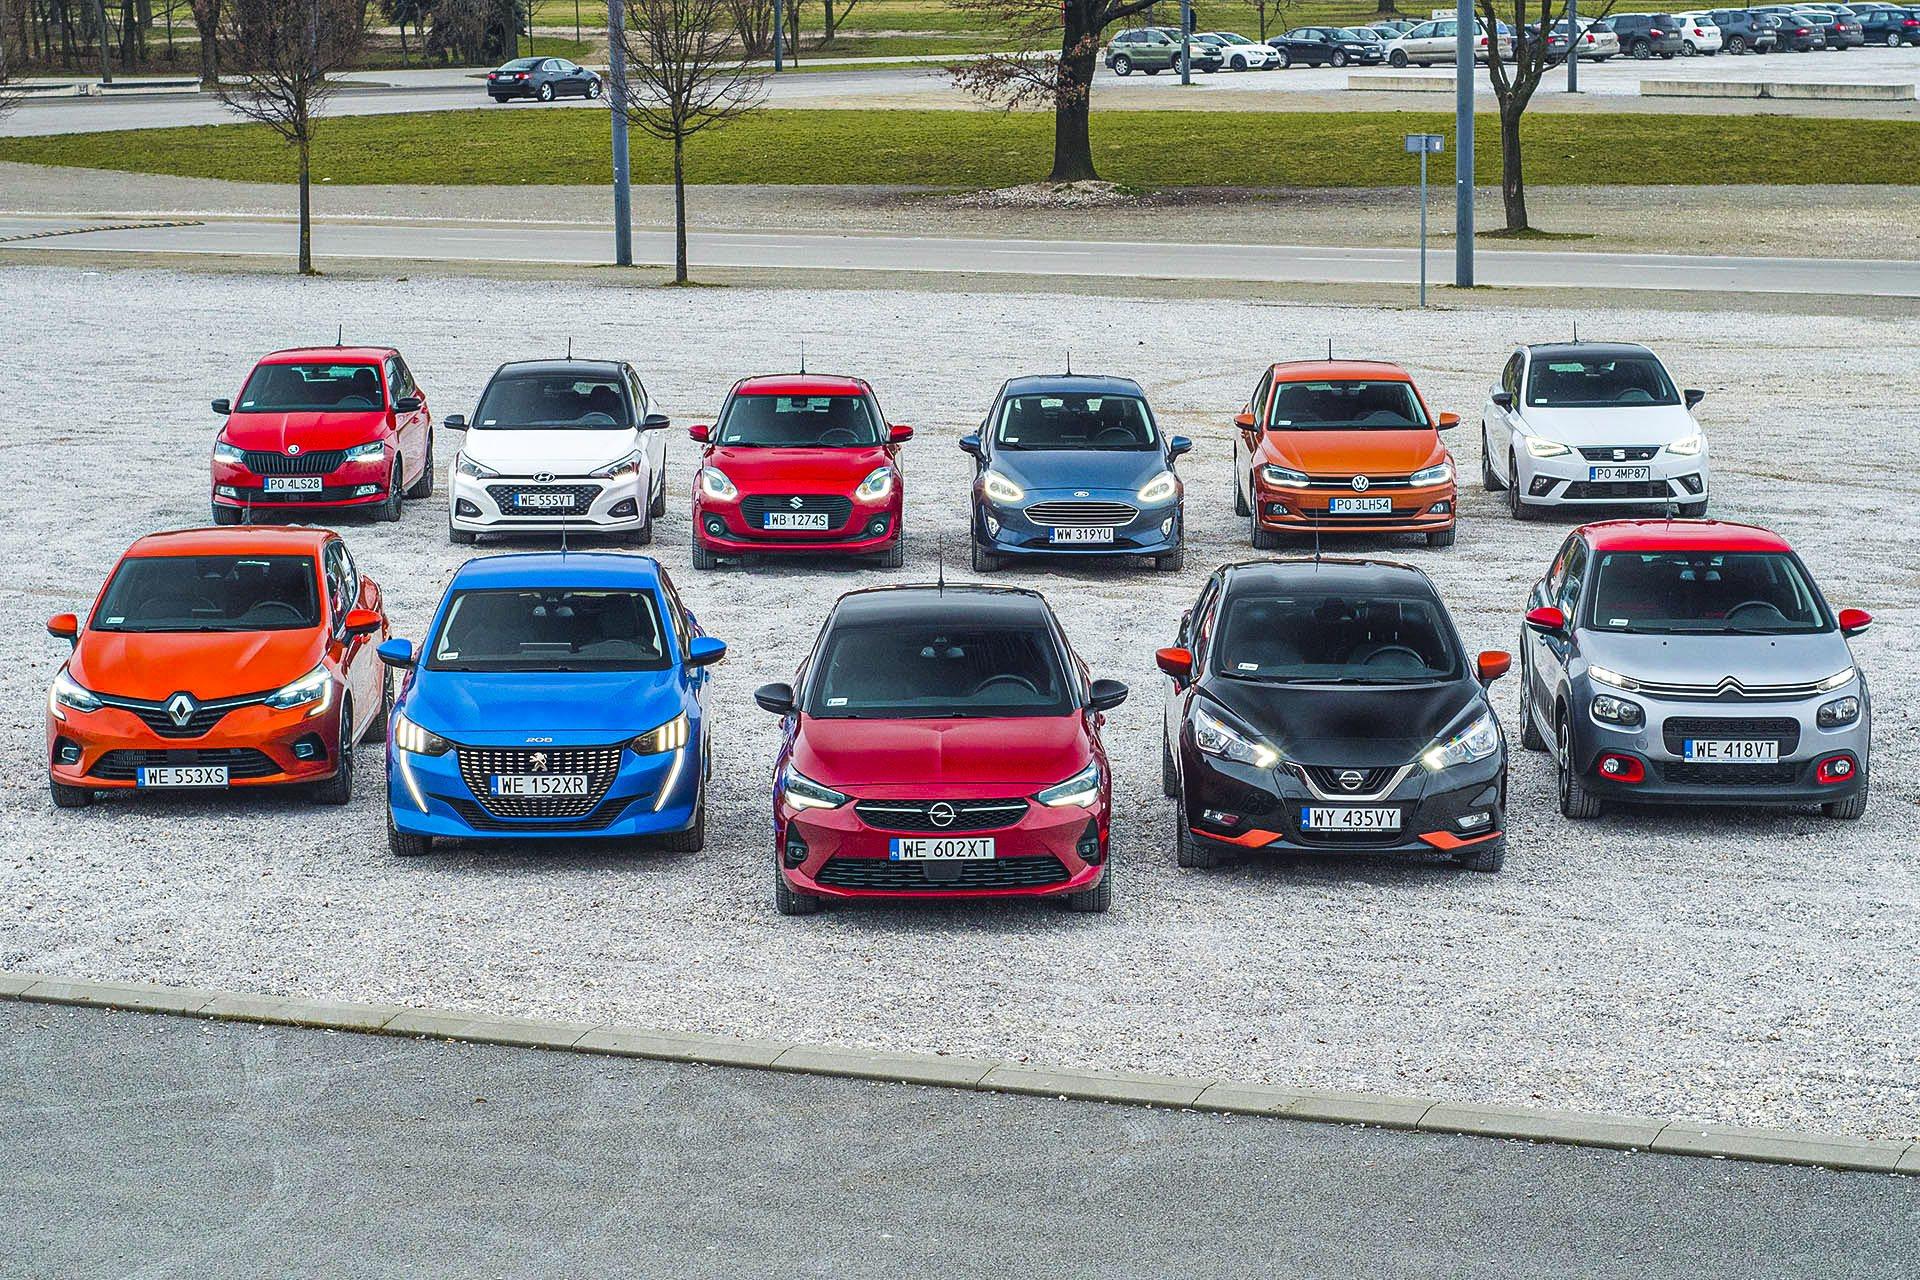 Citroen C3, Ford Fiesta, Hyundai i20, Nissan Micra, Opel Corsa, Peugeot 208, Renault Clio, Seat Ibiza, Skoda Fabia, Suzuki Swift, Volkswagen Polo – PORÓWNANIE